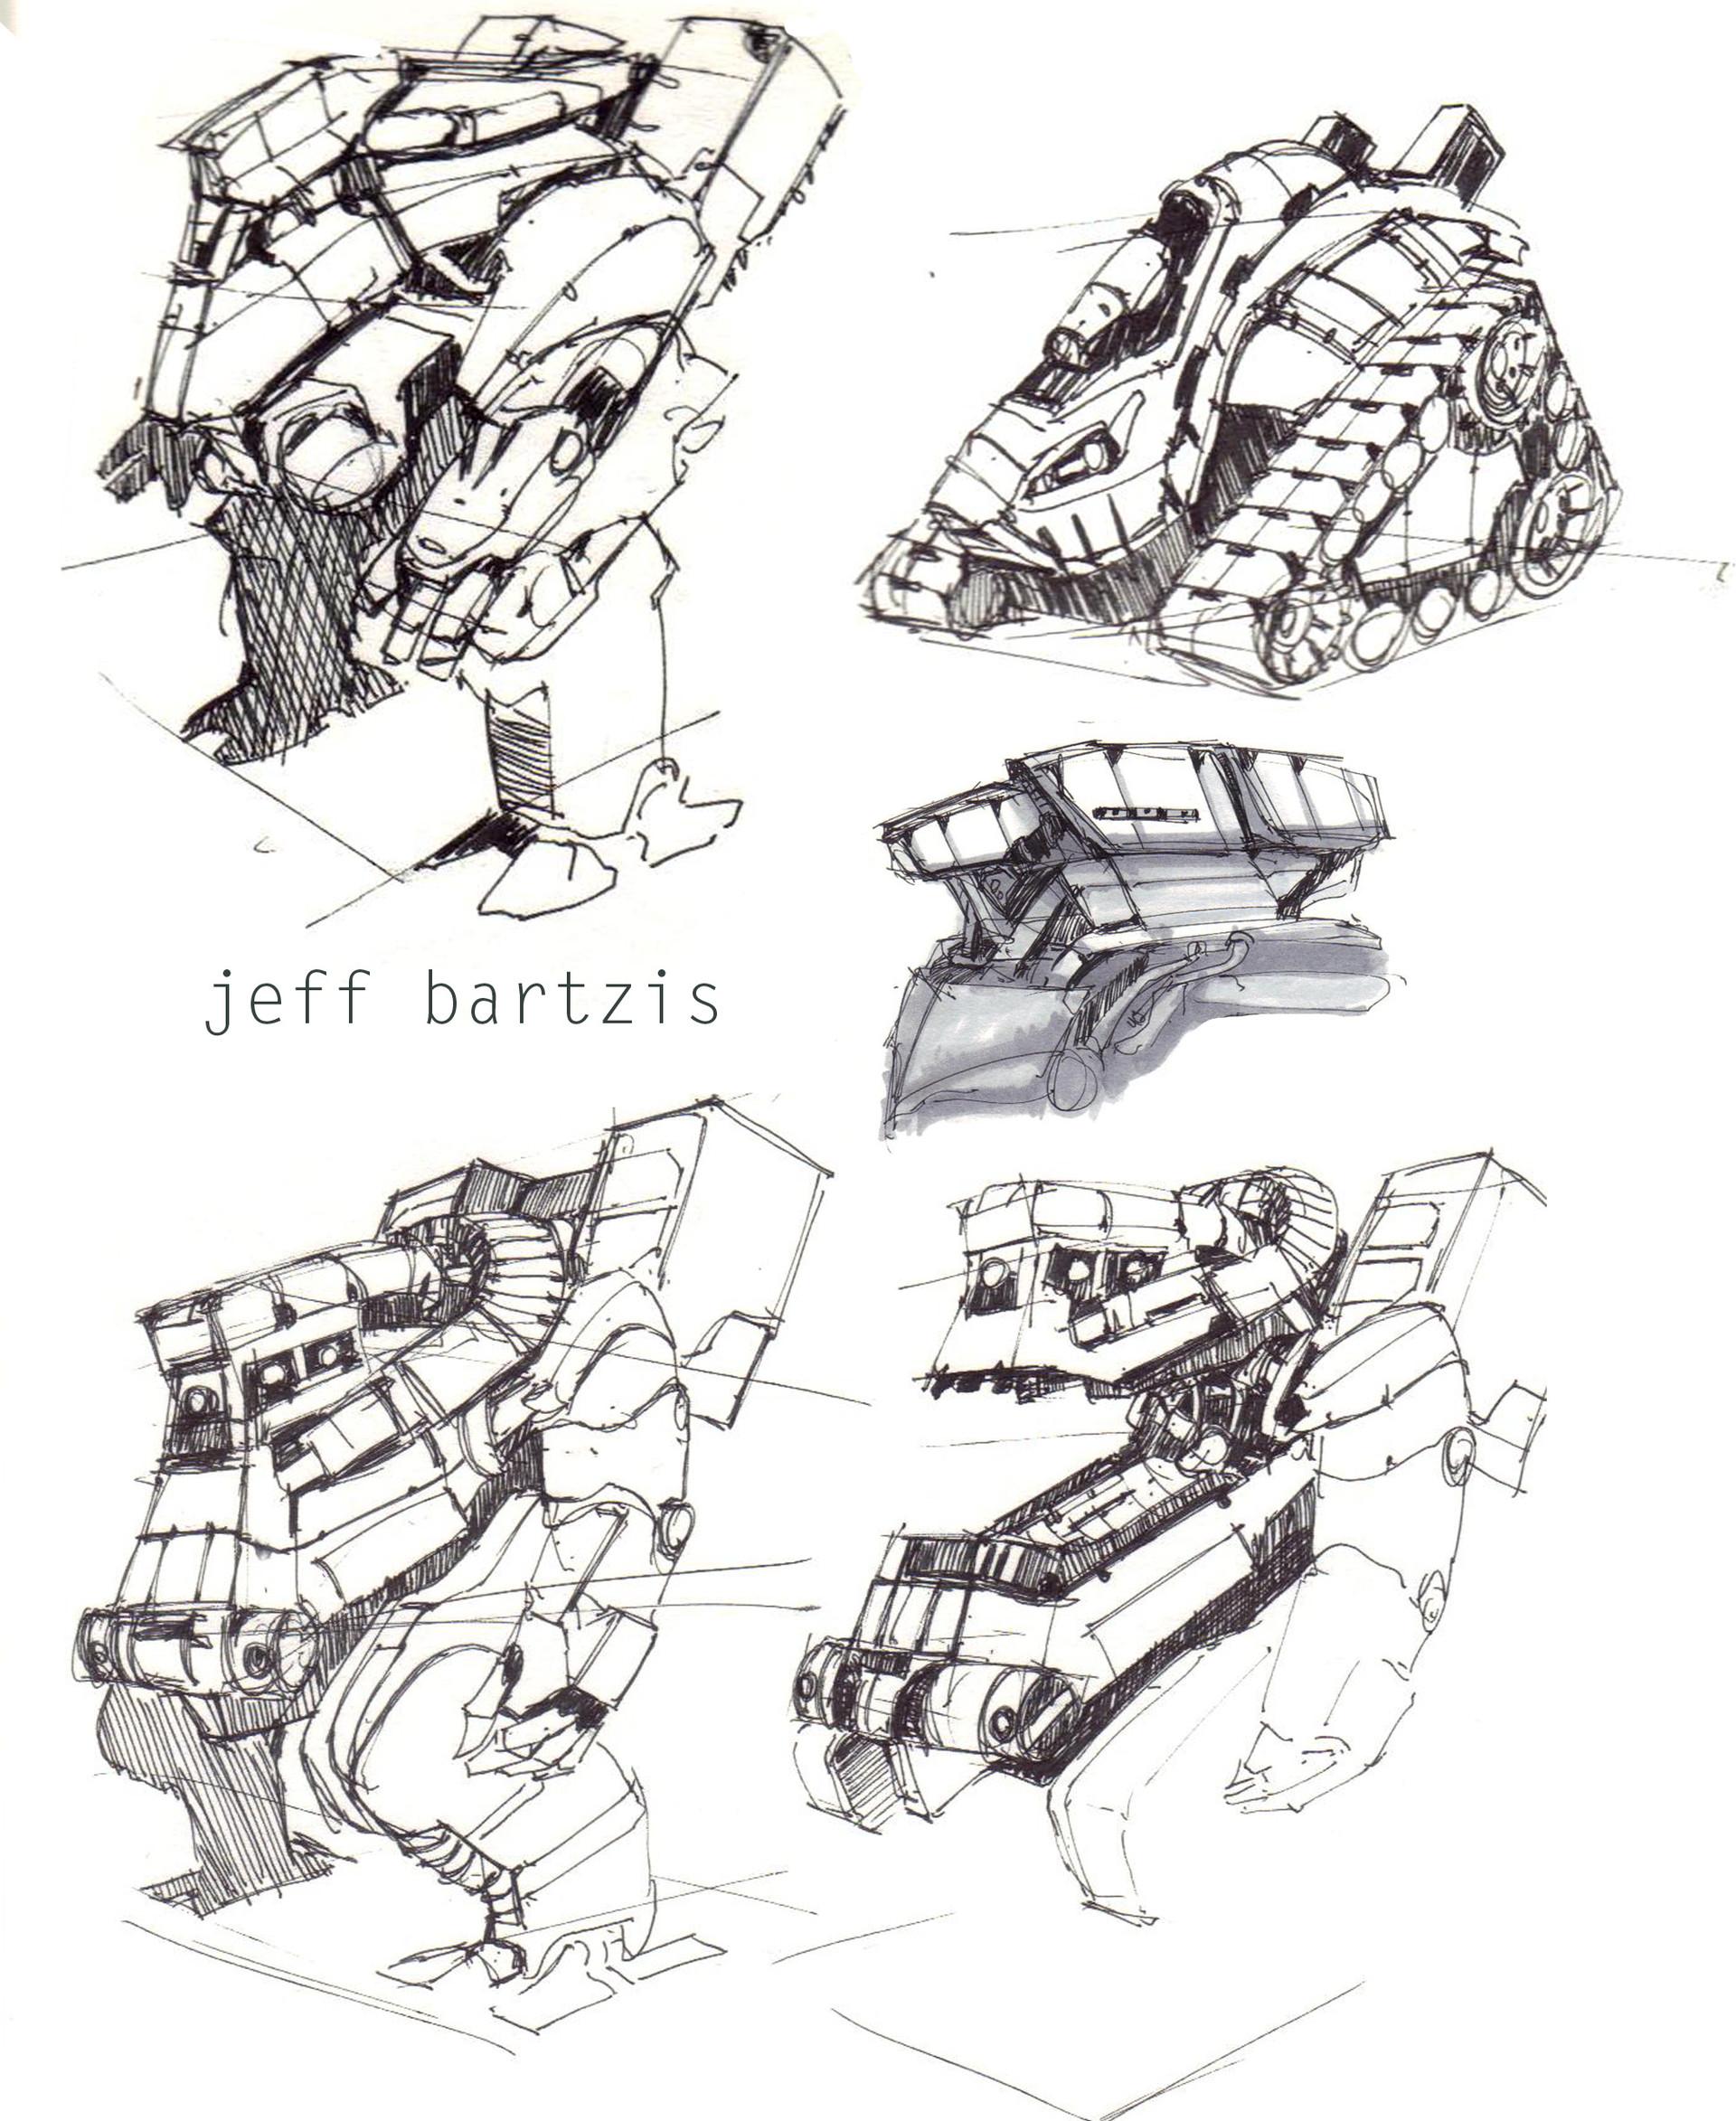 Jeff bartzis sketchbook stuff 045 7ty